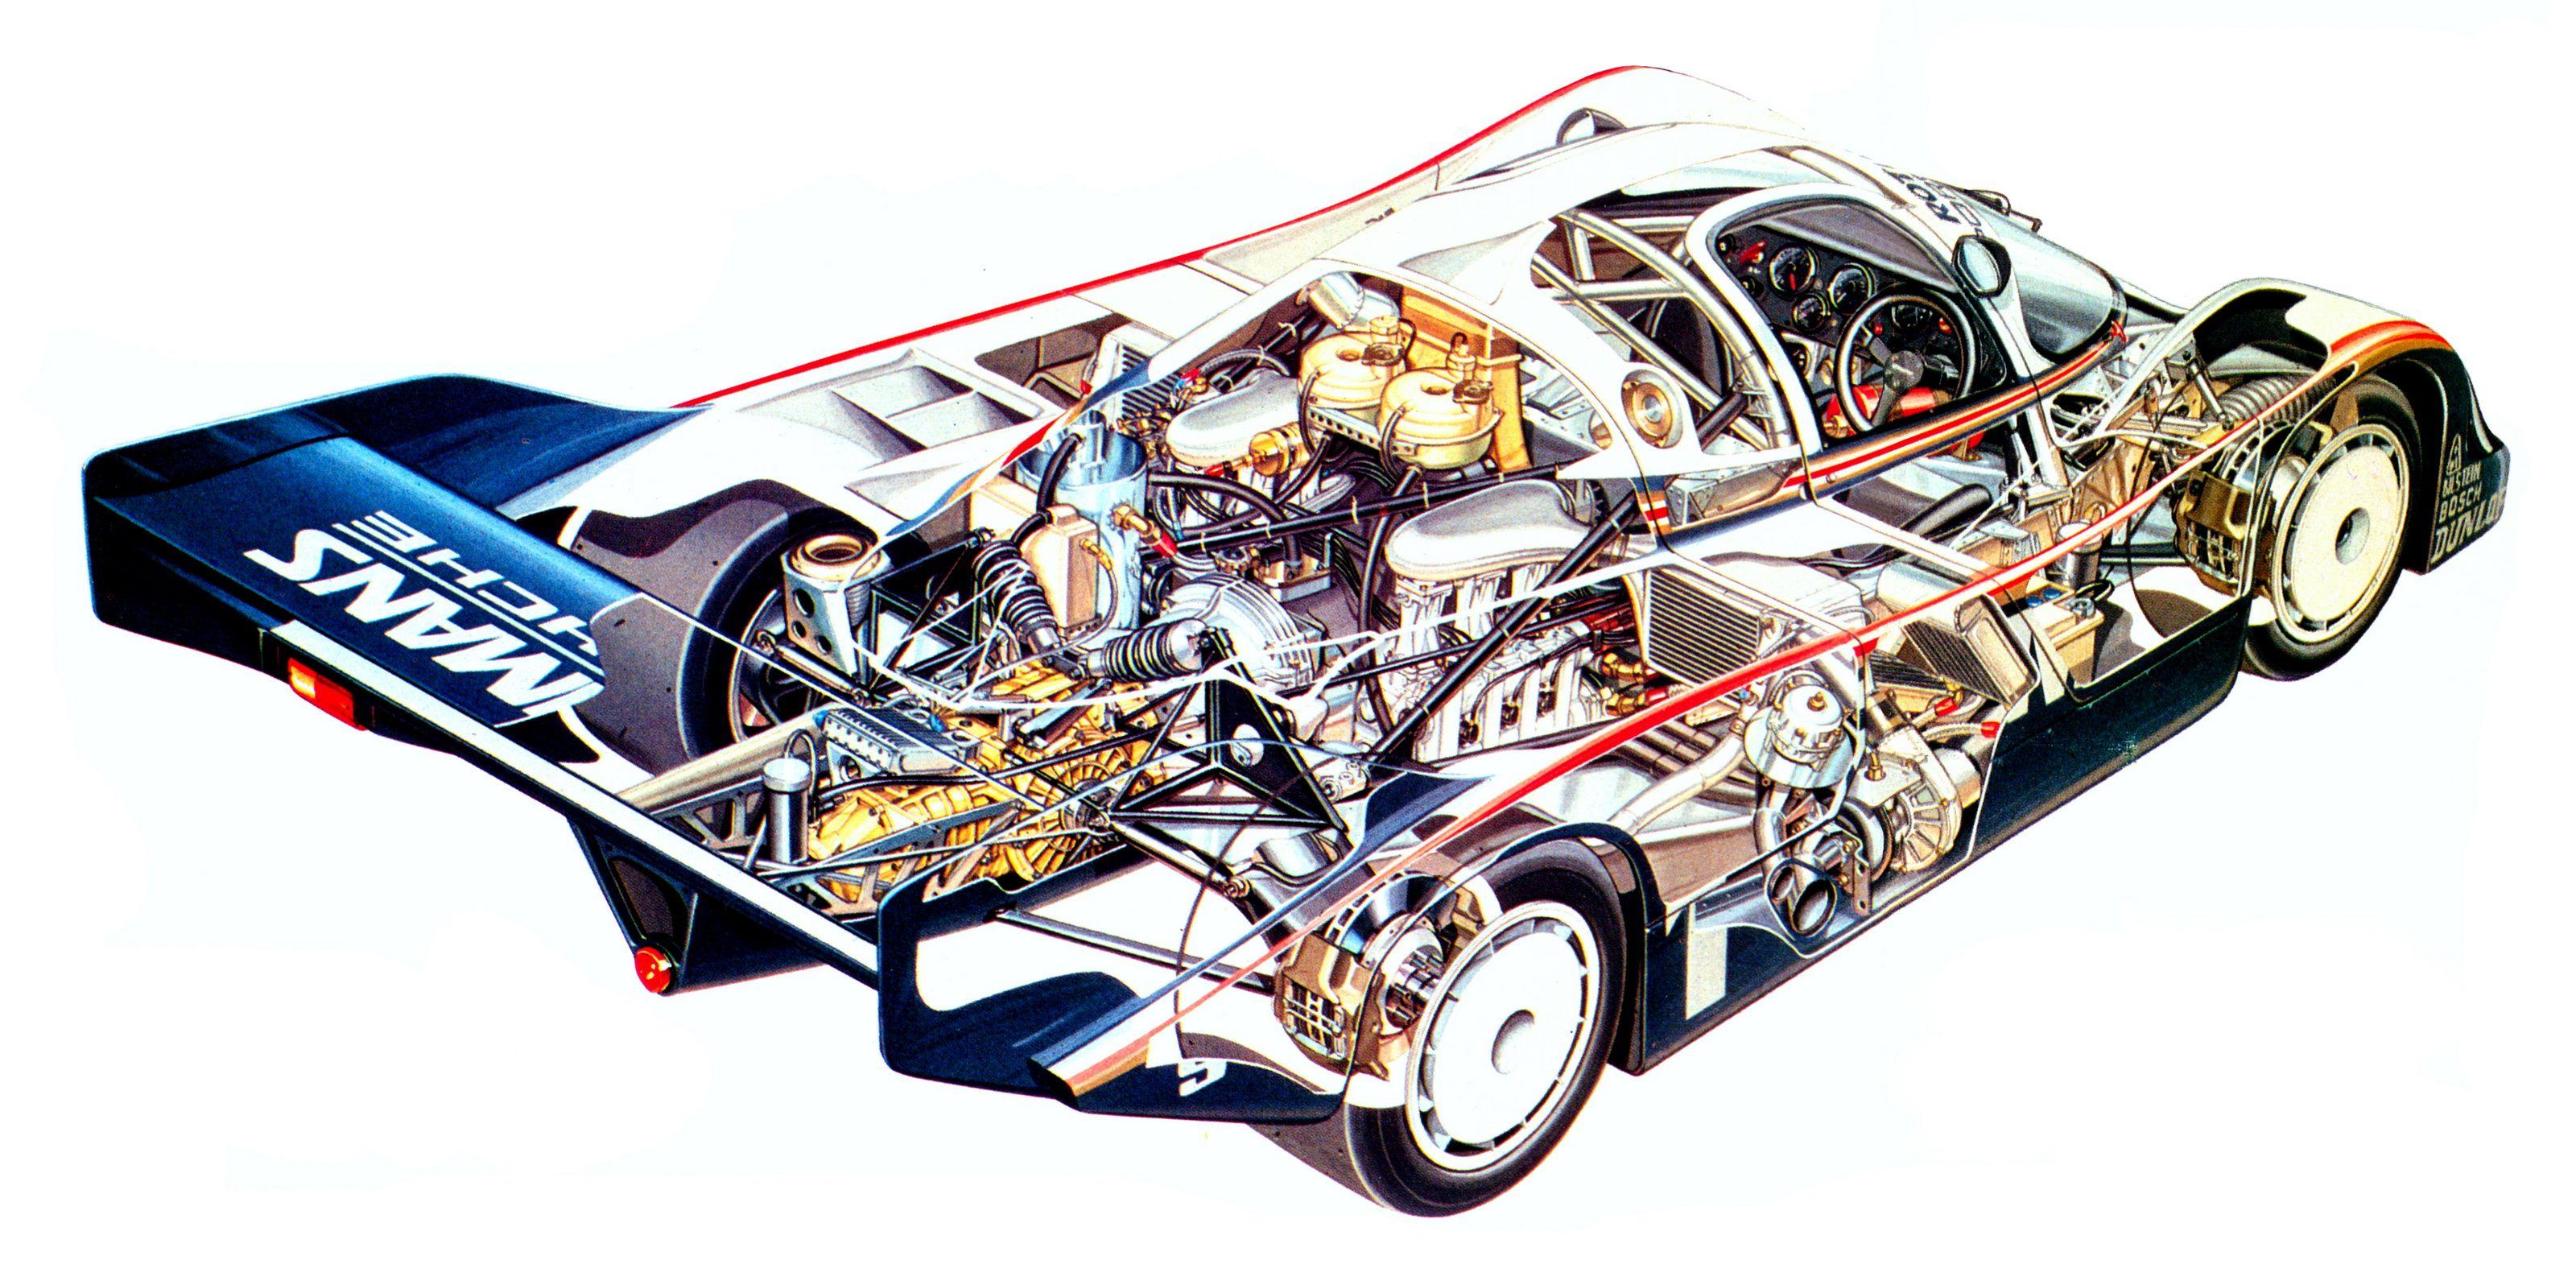 Porsche cutaways . | SMCars.Net - Car Blueprints Forum | Race Car ...